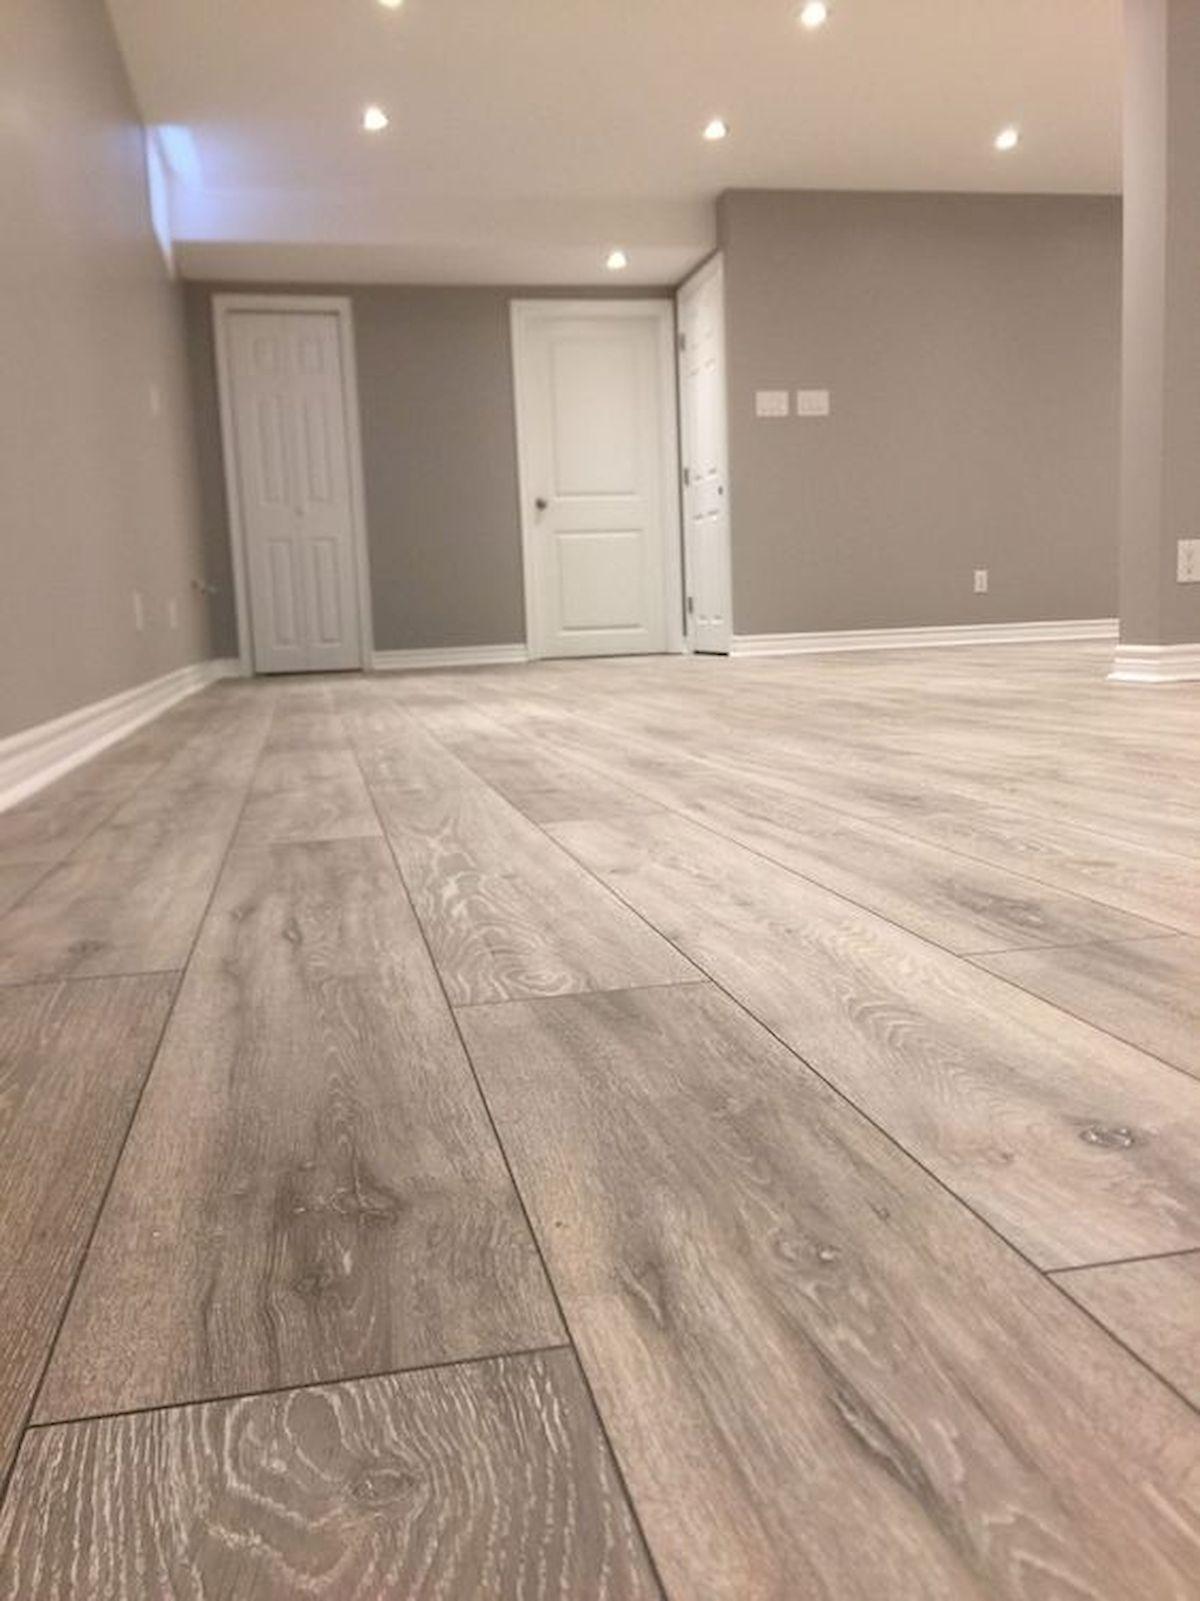 80 Gorgeous Hardwood Floor Ideas For Interior Home H